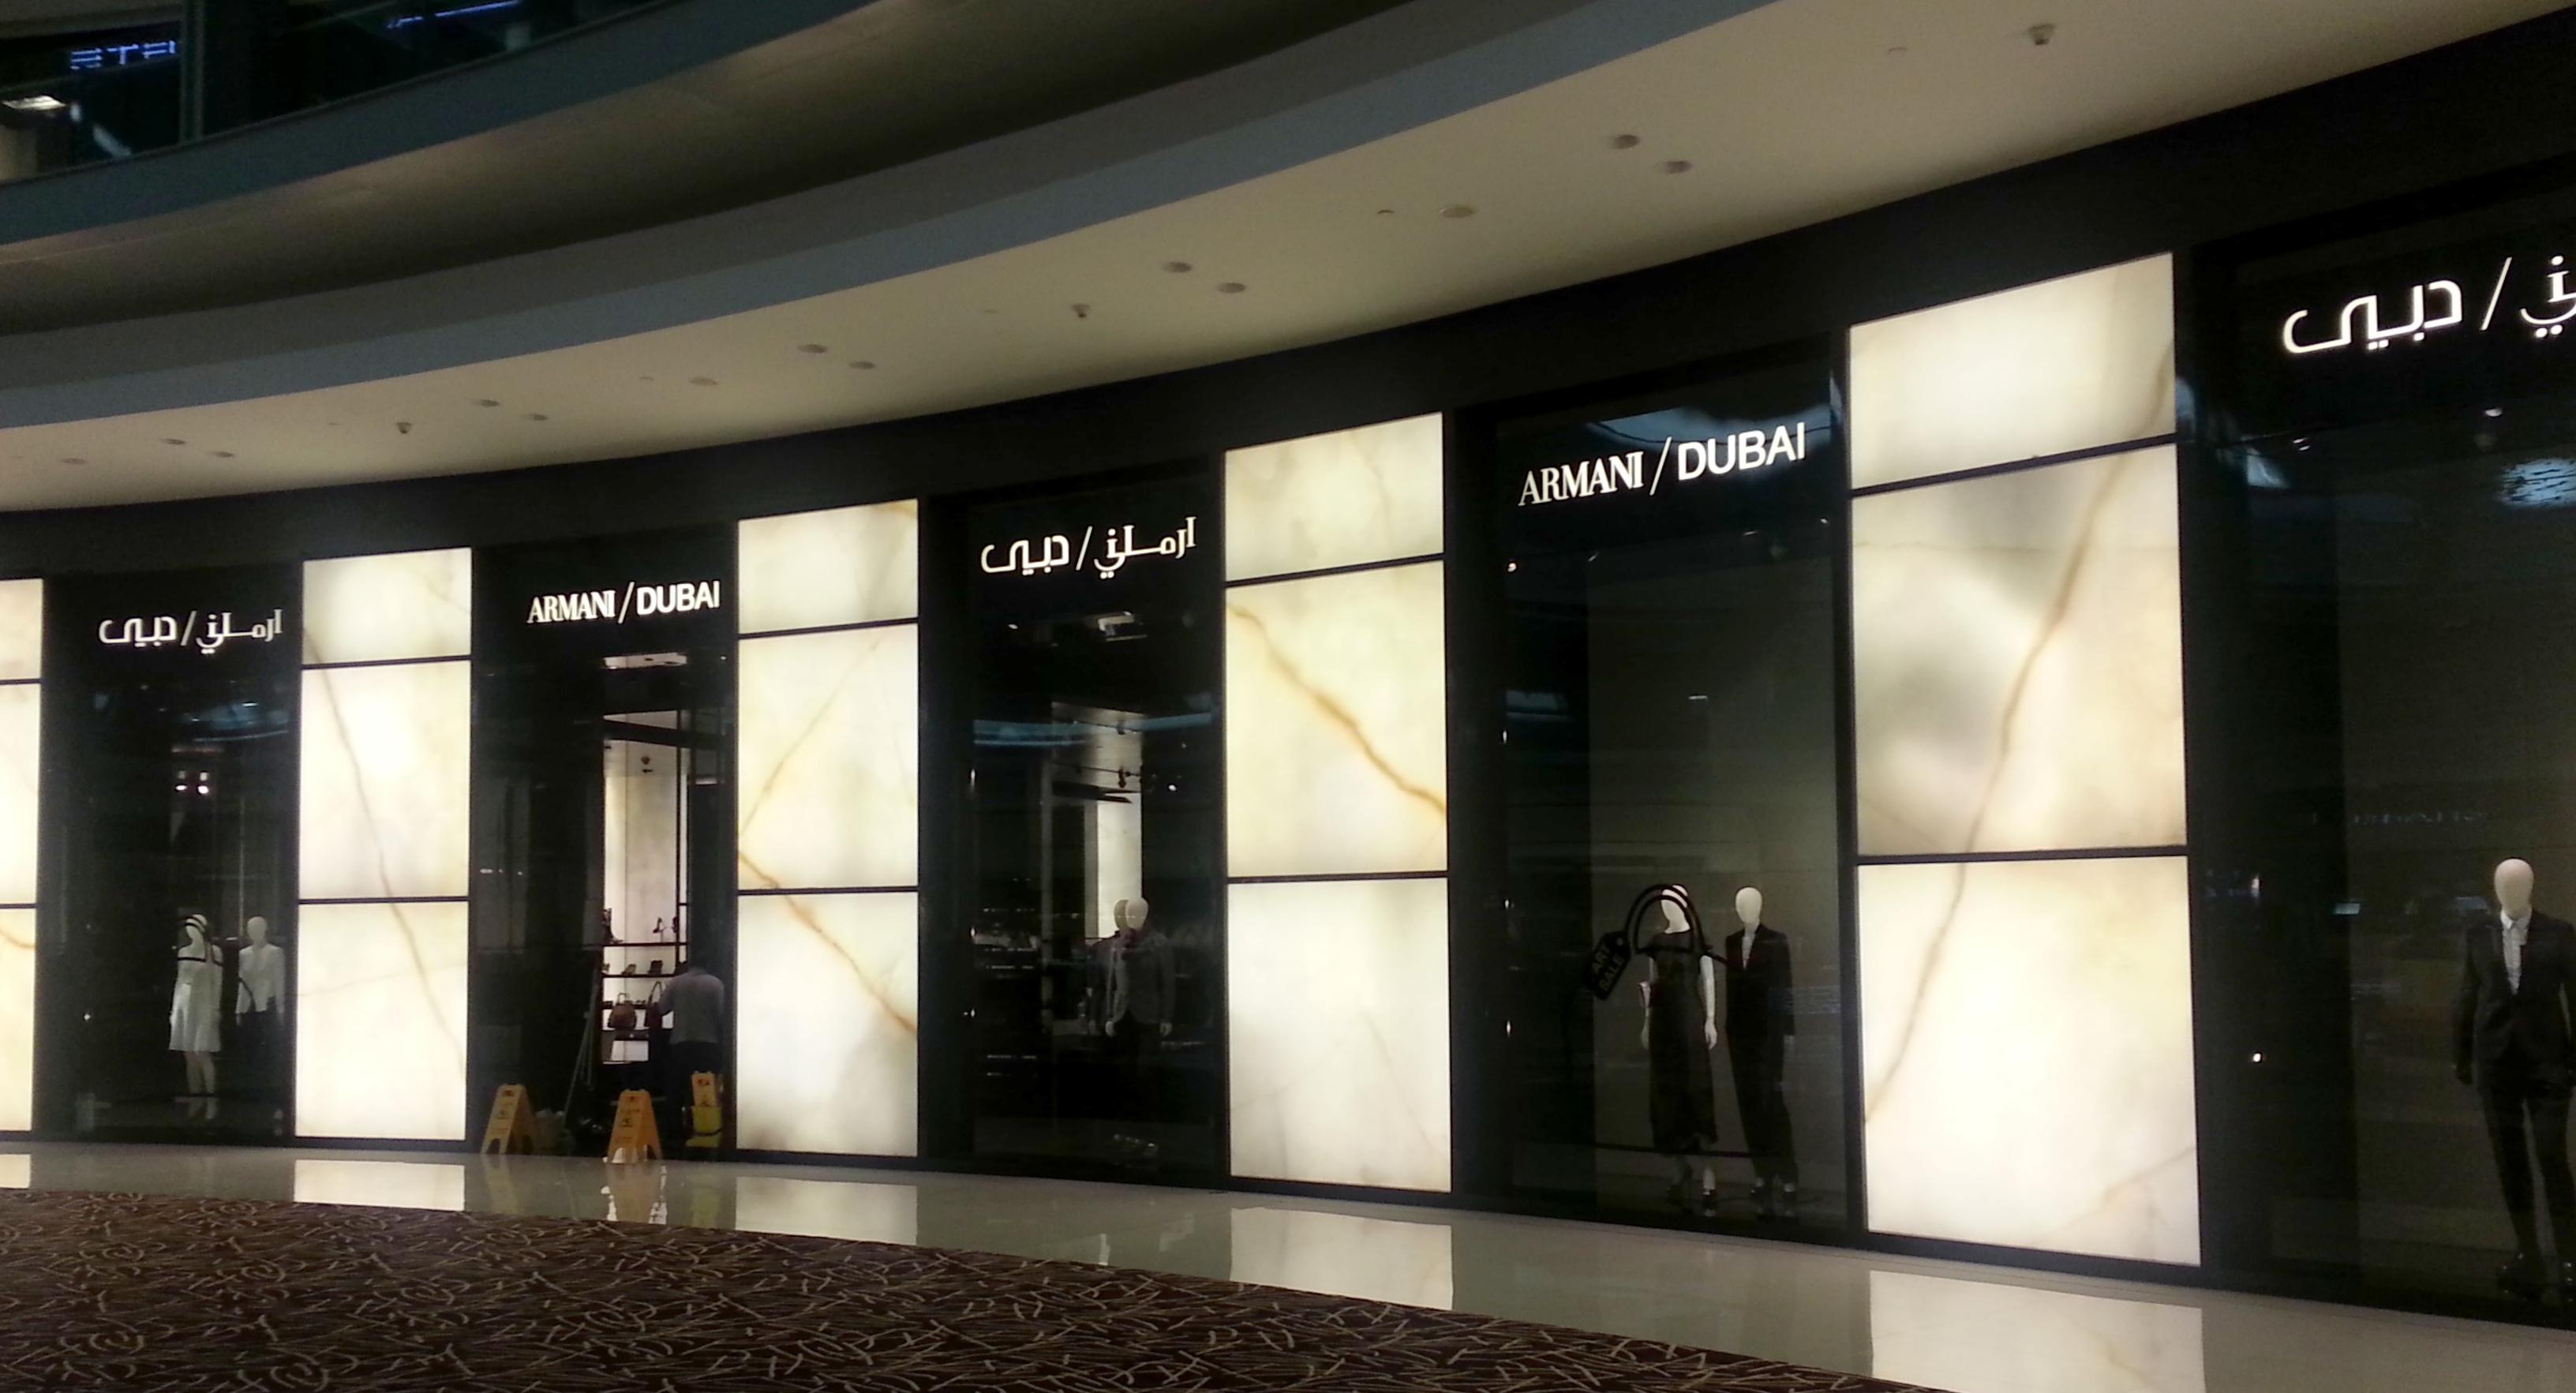 Good armani dubai mall photos lrzo for Armadi outlet